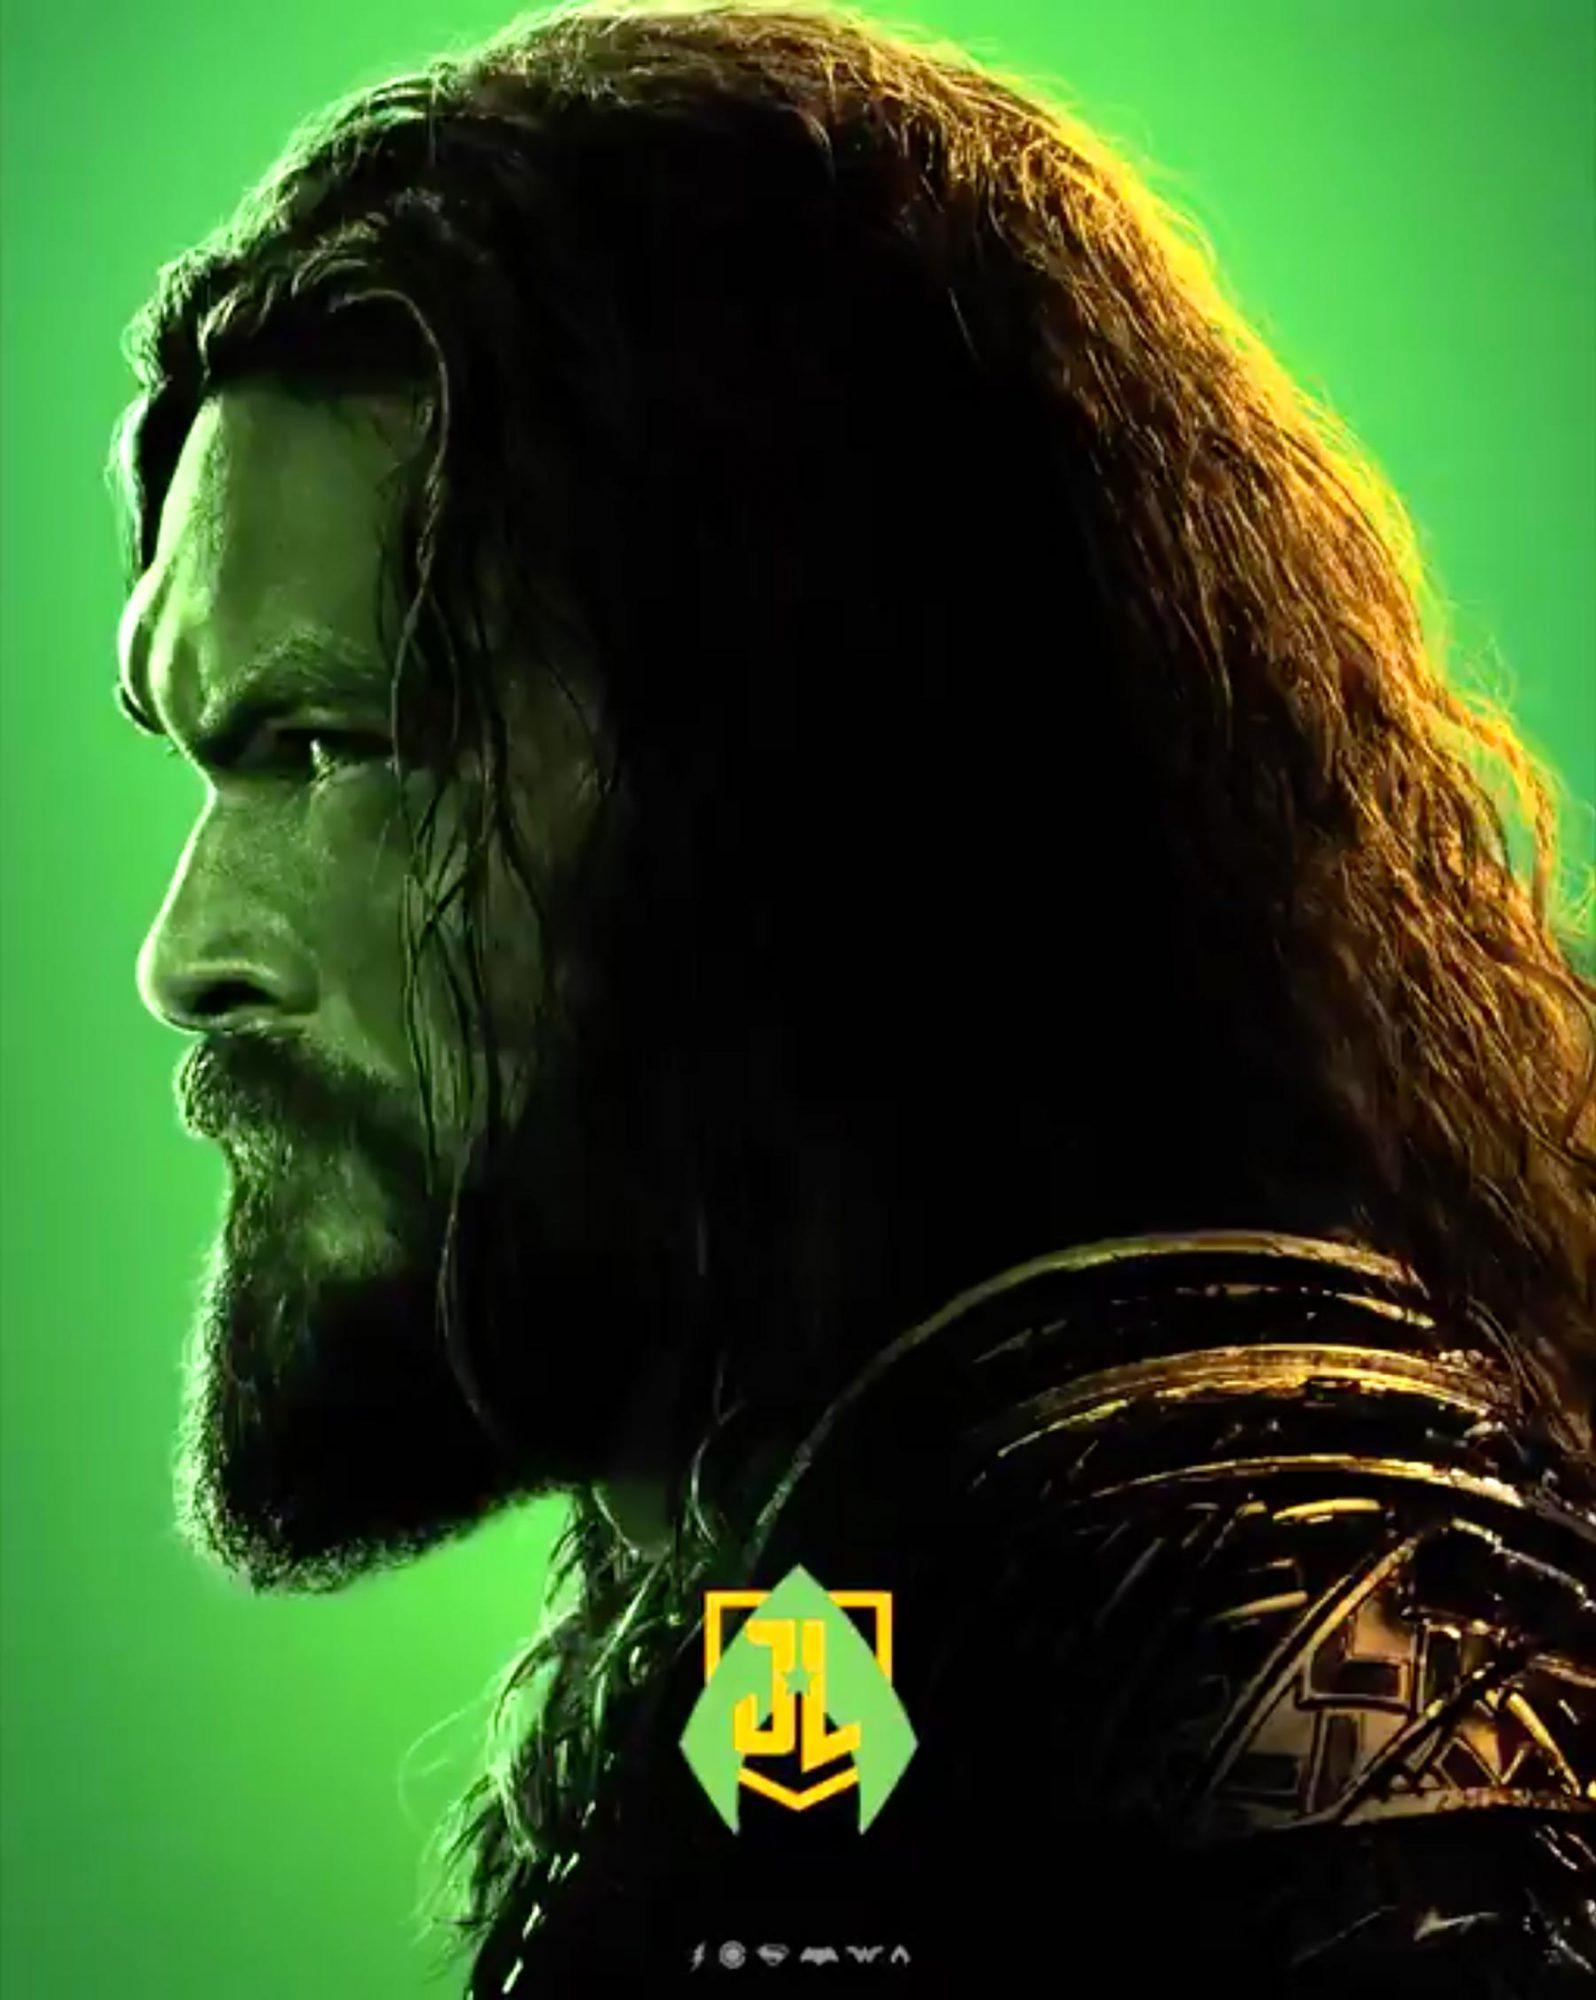 Justice League Poster CR: DC